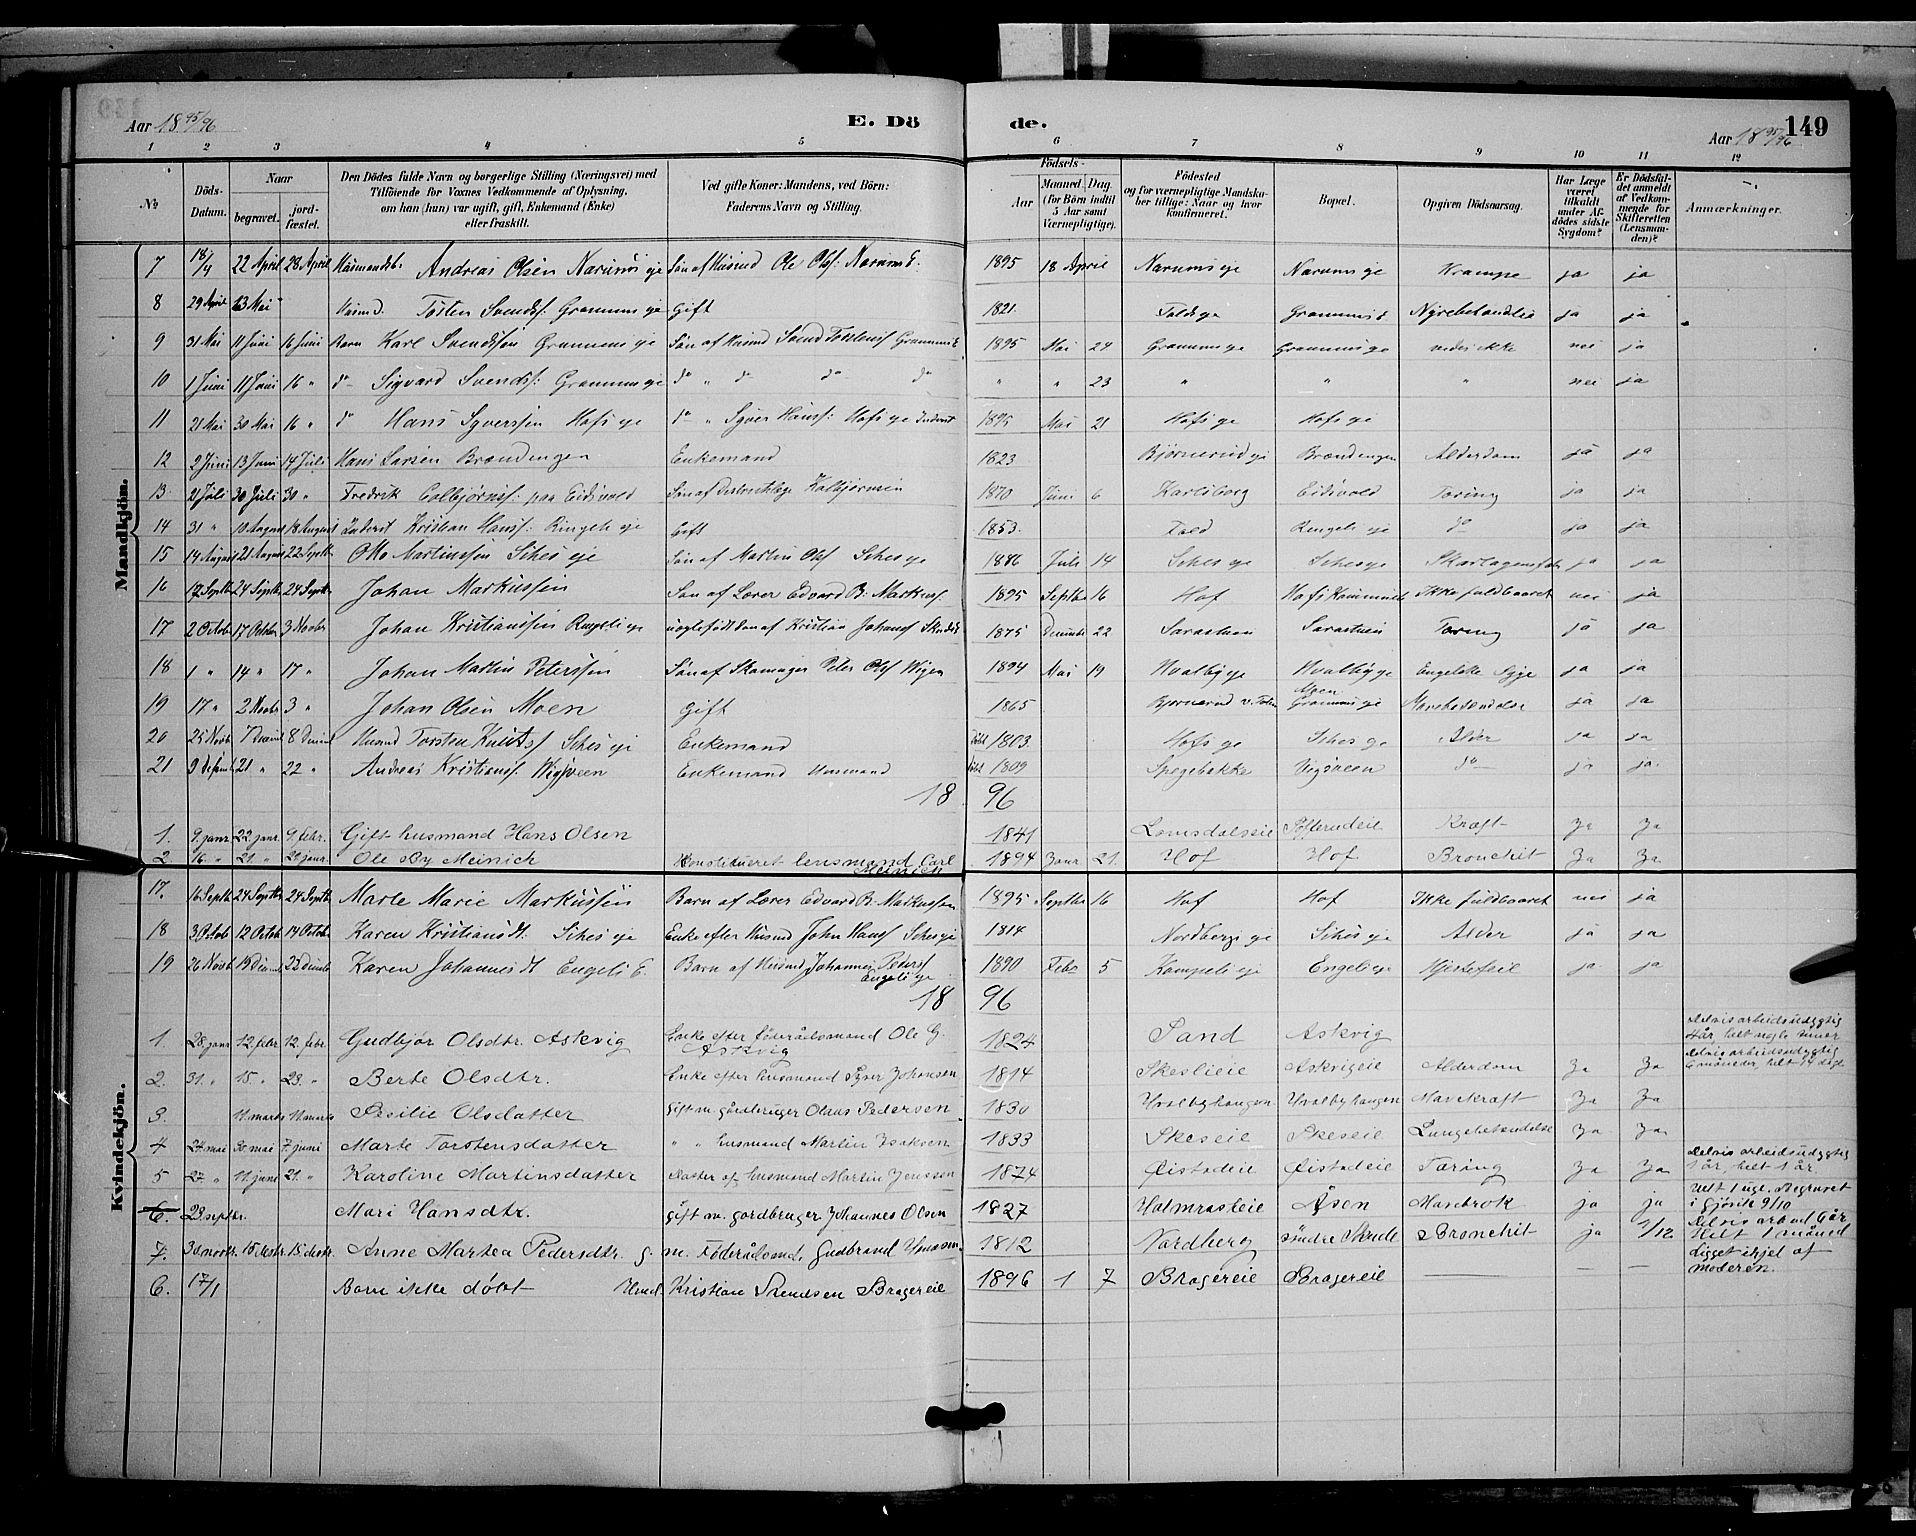 SAH, Søndre Land prestekontor, L/L0002: Klokkerbok nr. 2, 1884-1900, s. 149